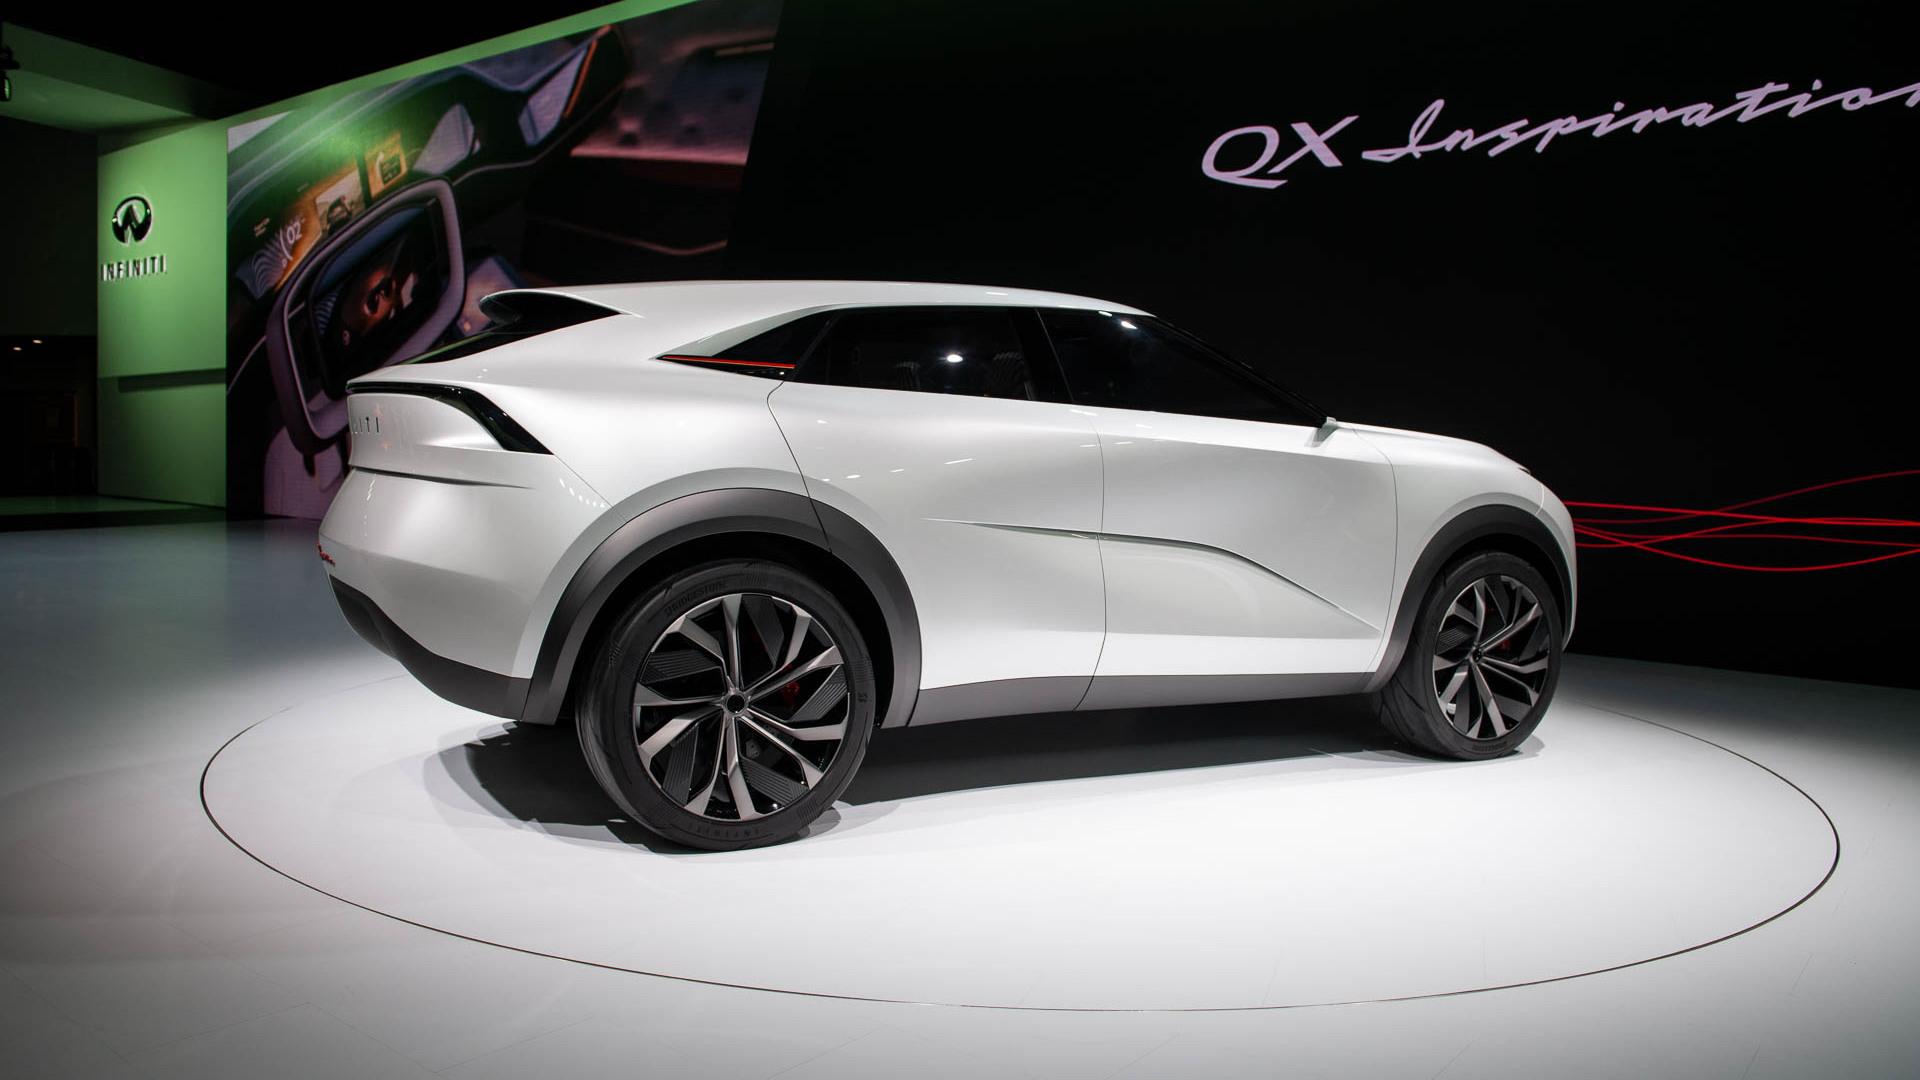 Infiniti QX Inspiration SUV concept, 2019 Detroit auto show